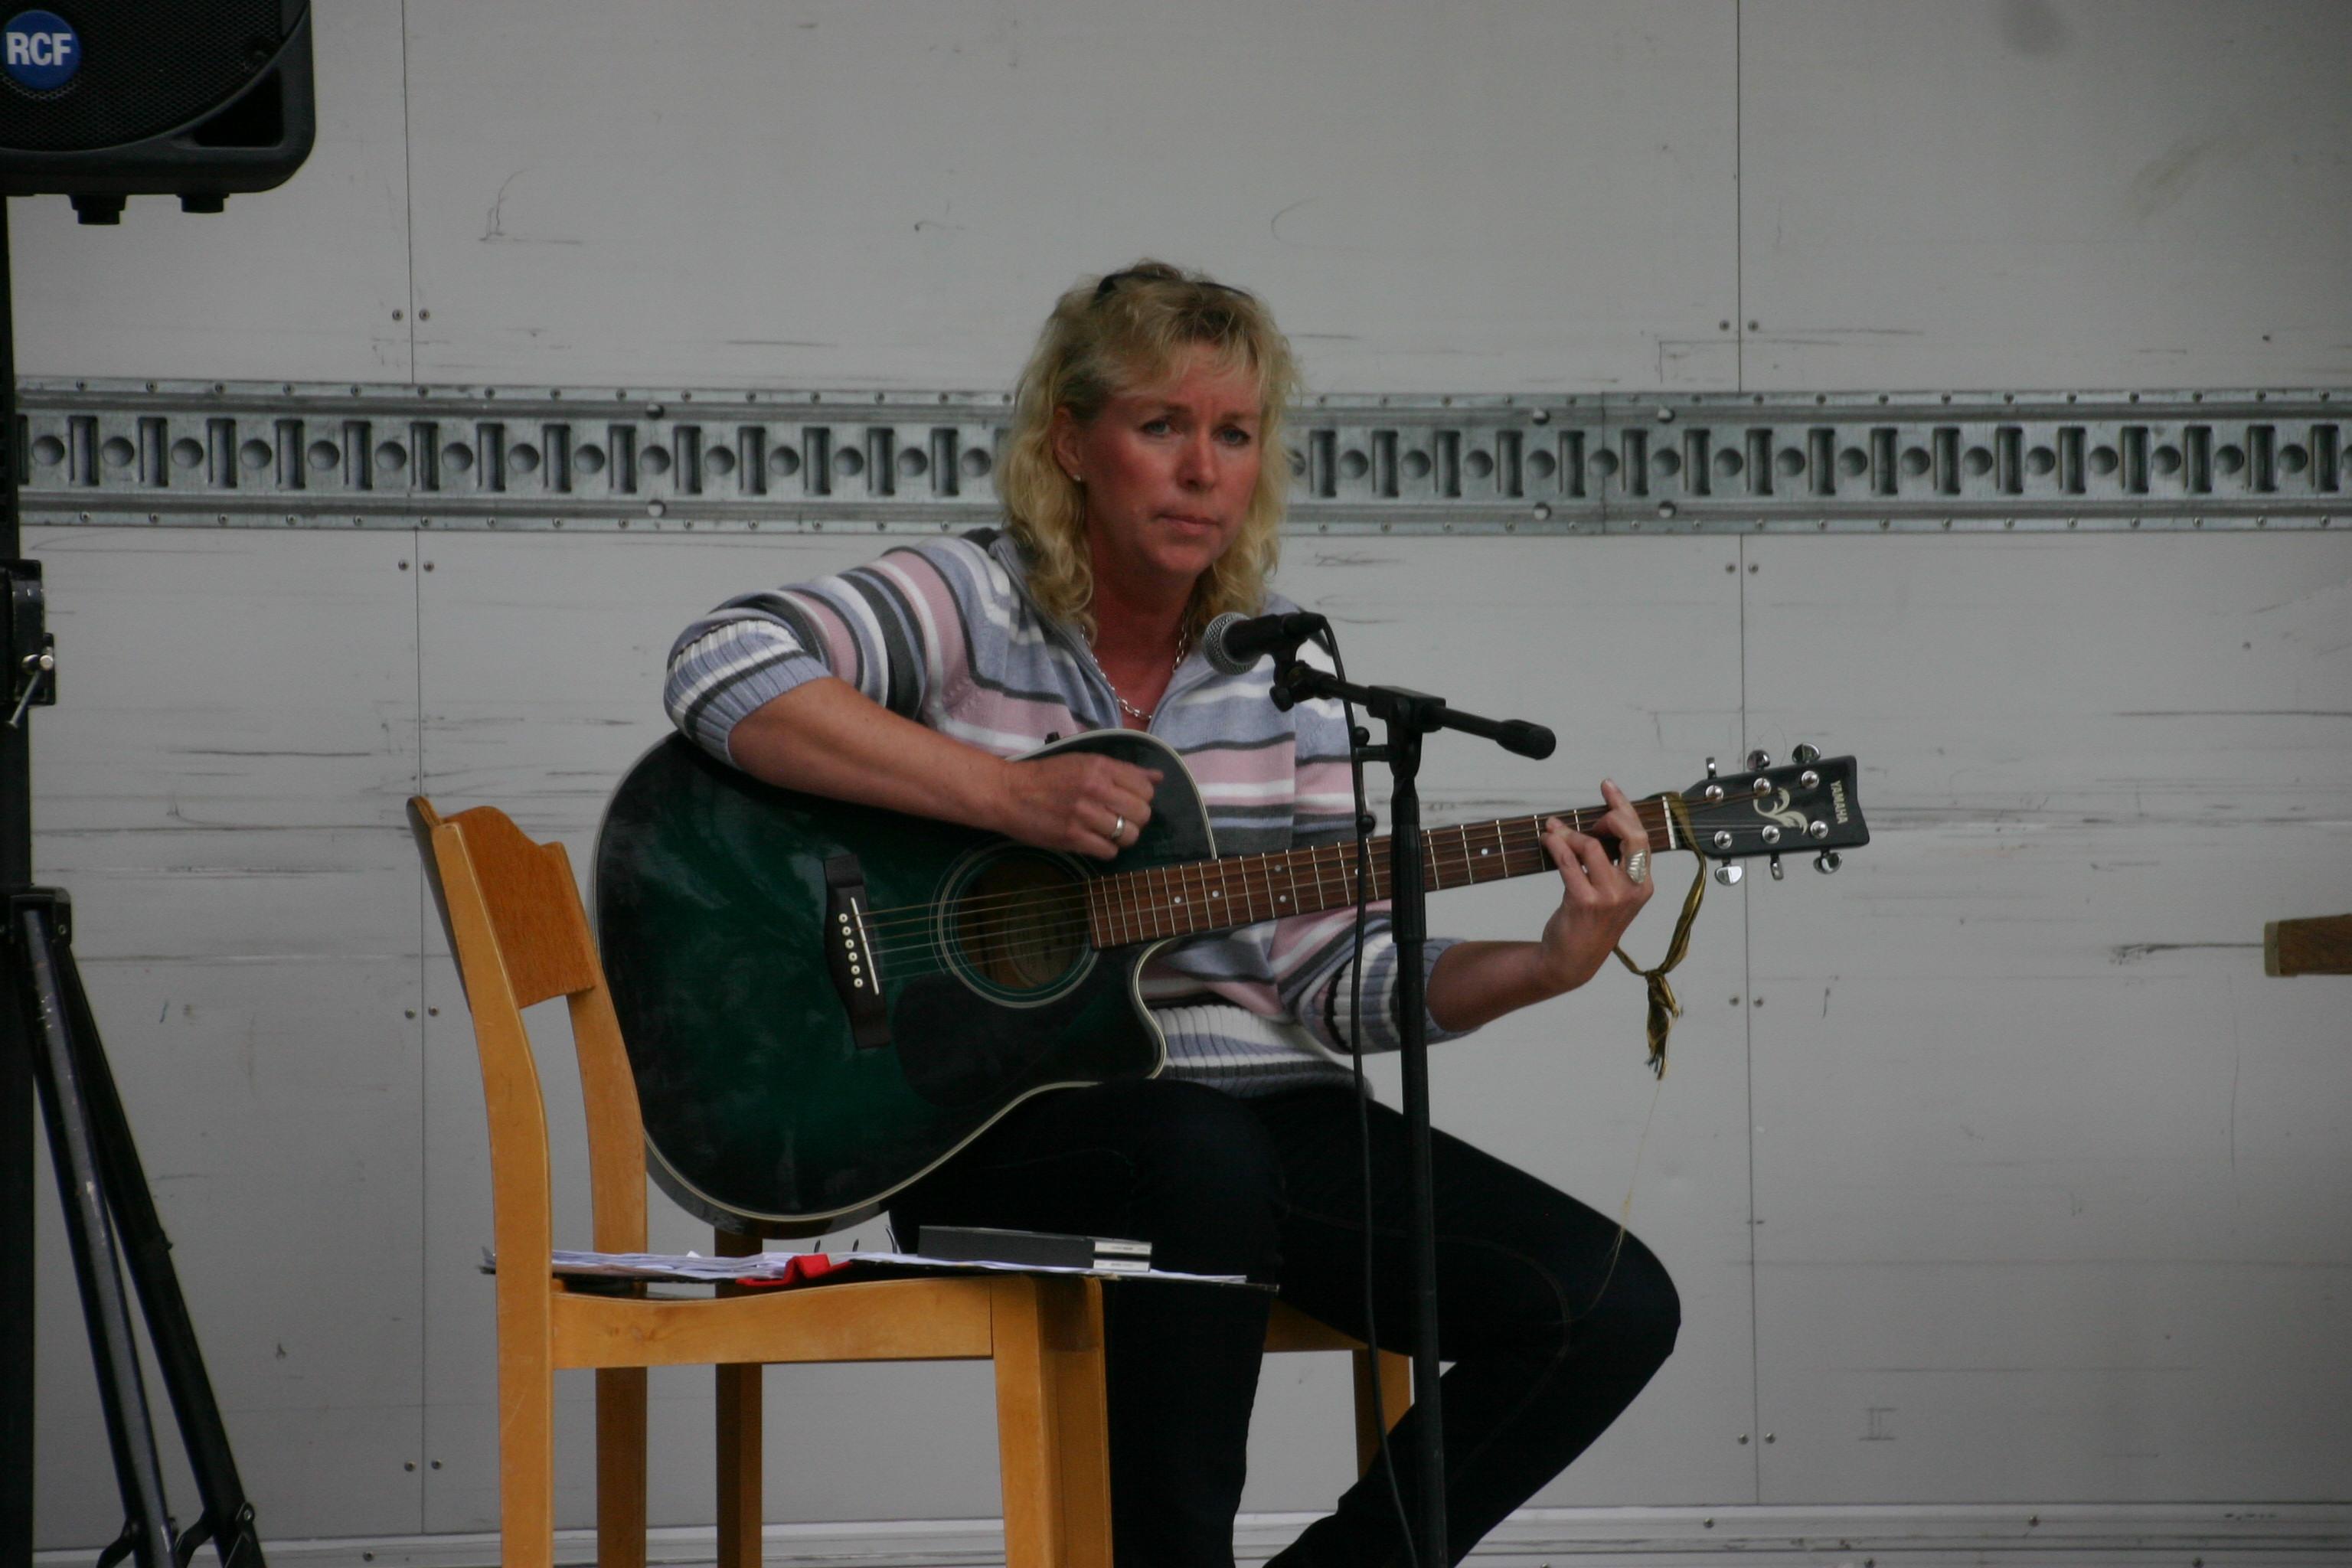 hackvaddagen-2011-116